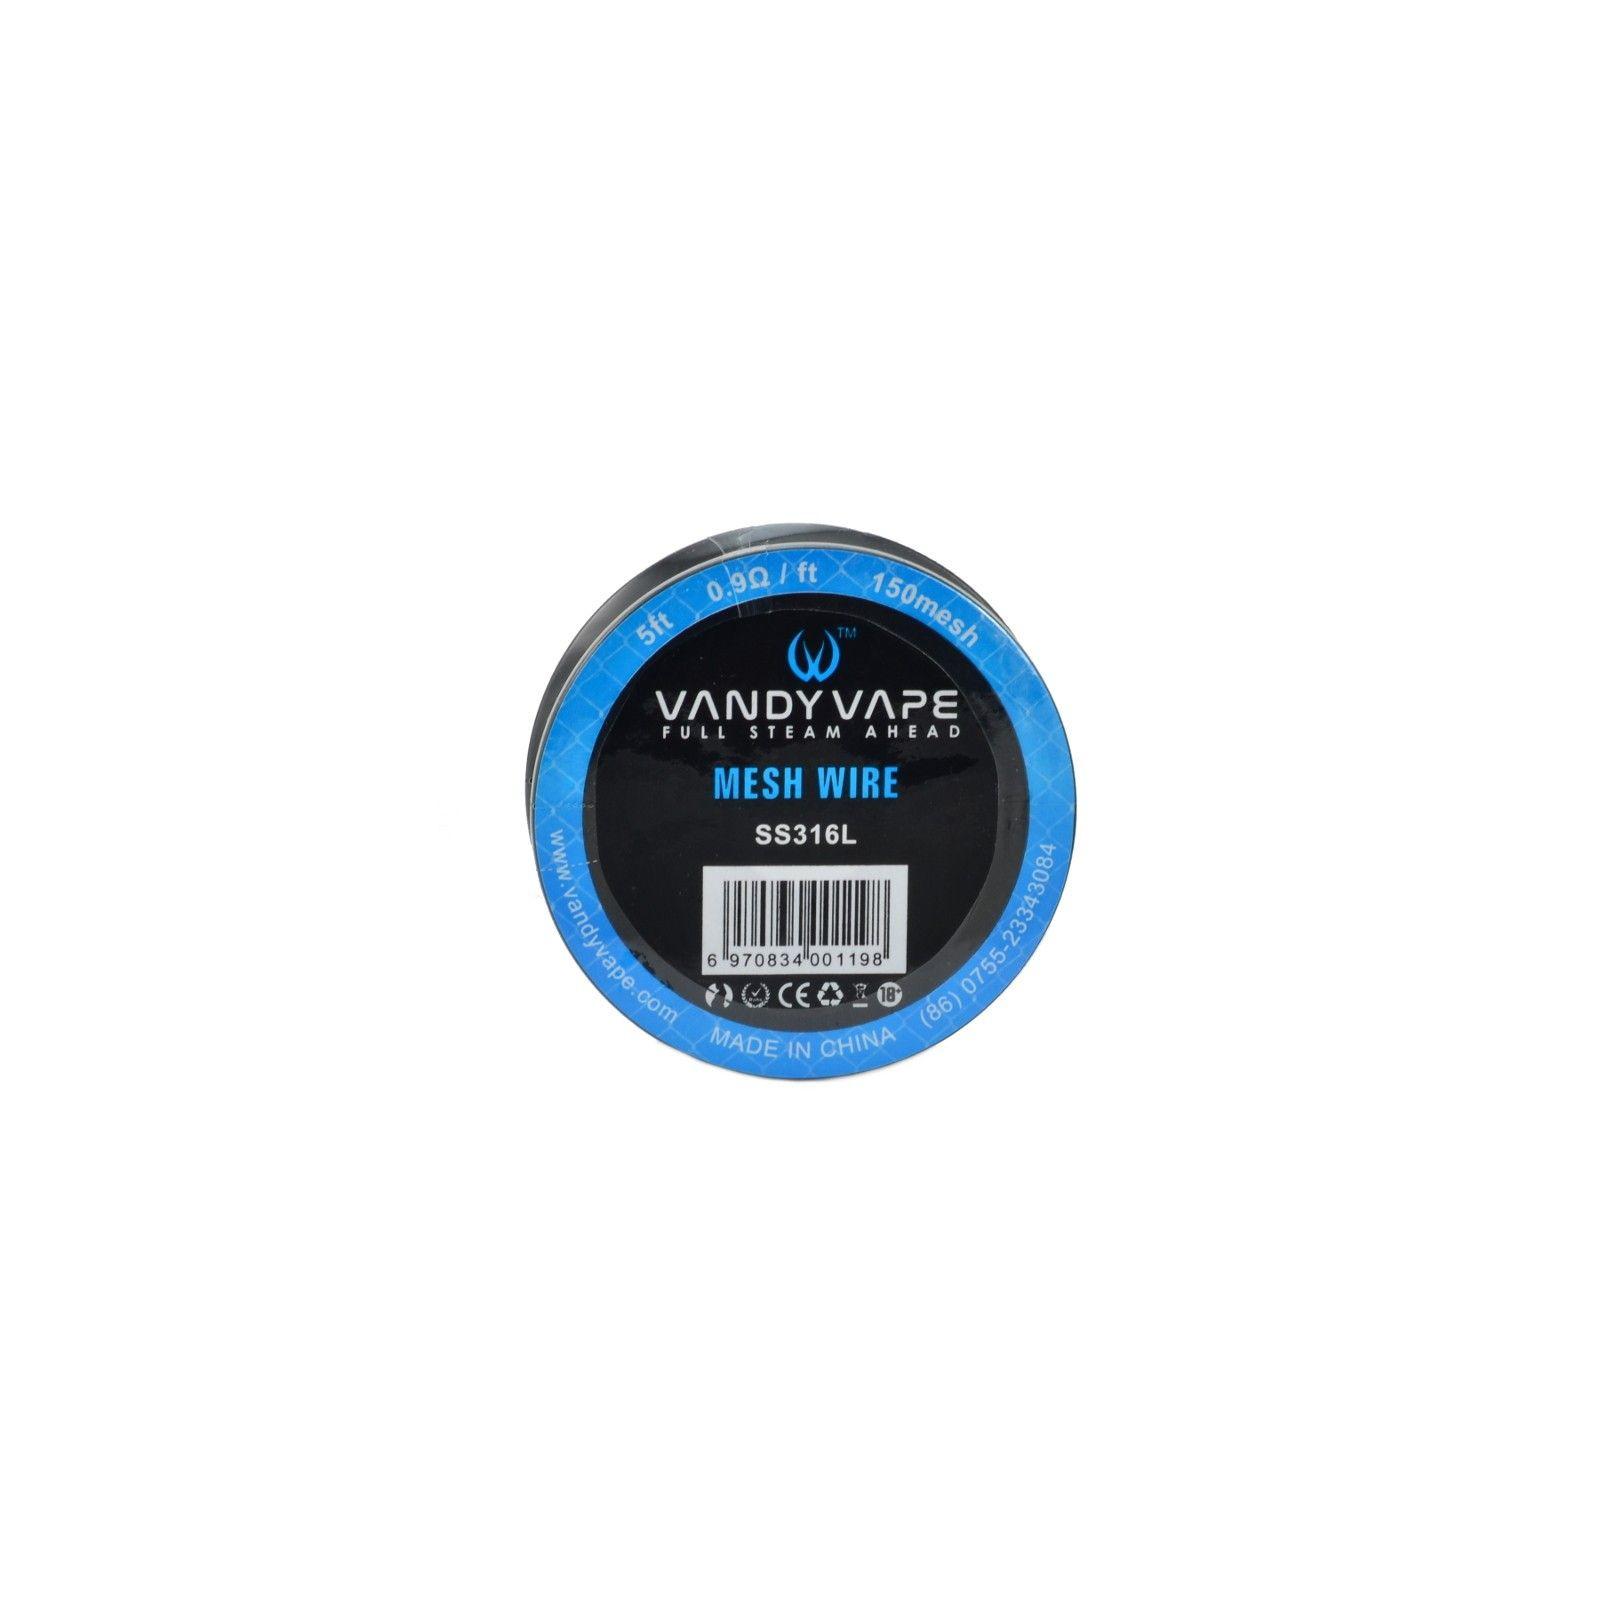 Mesh Wire - Vandy Vape